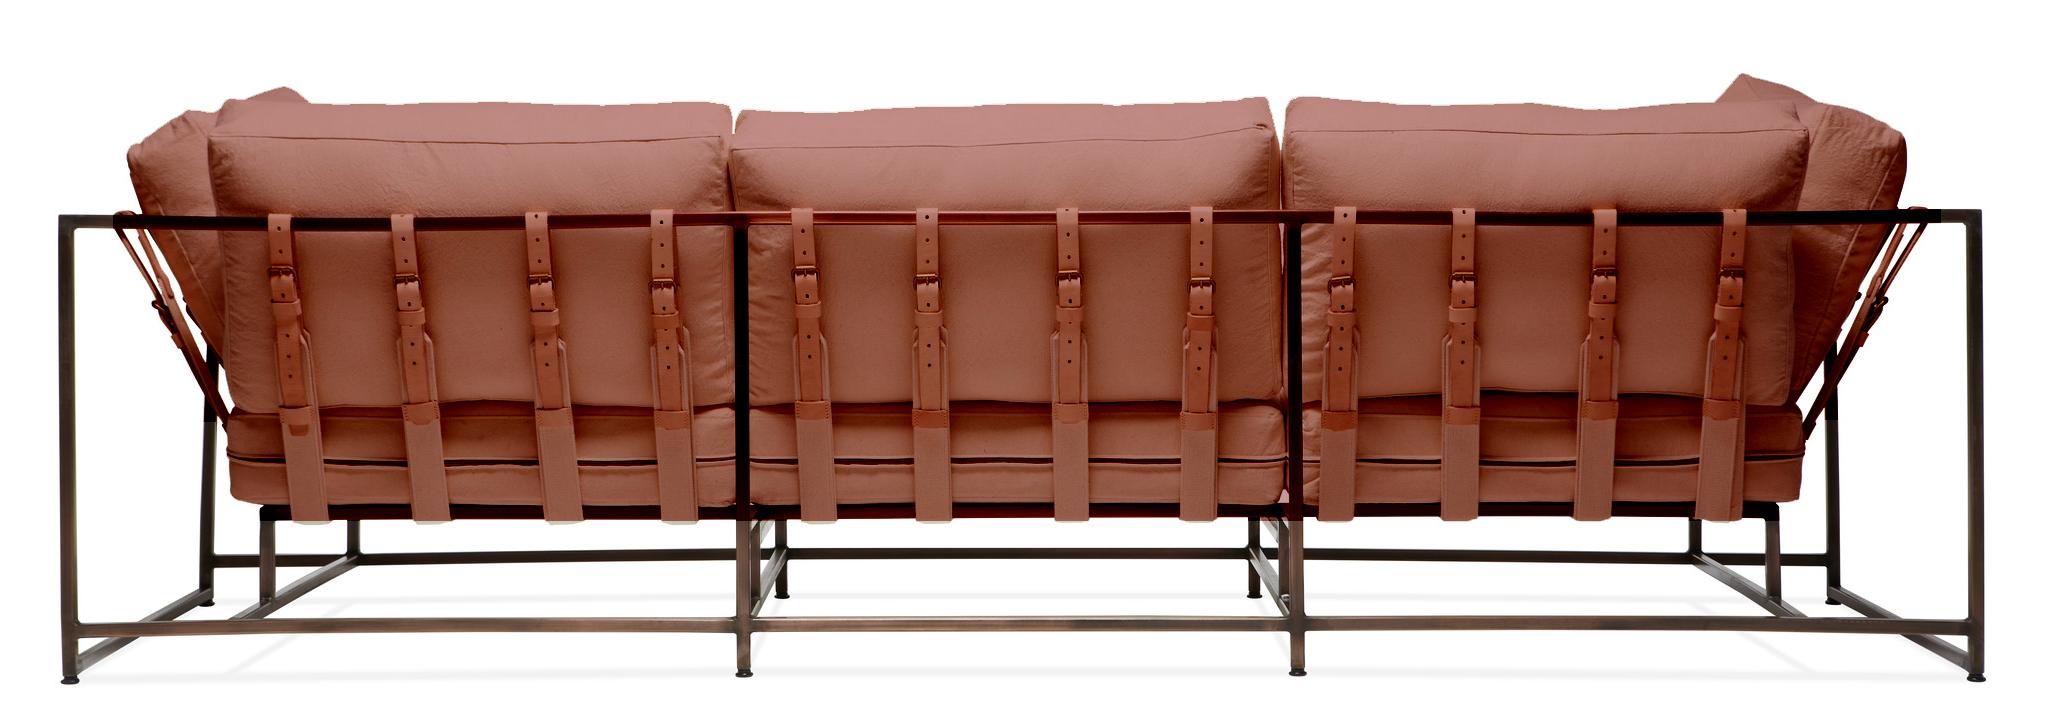 sofa malvarrosa